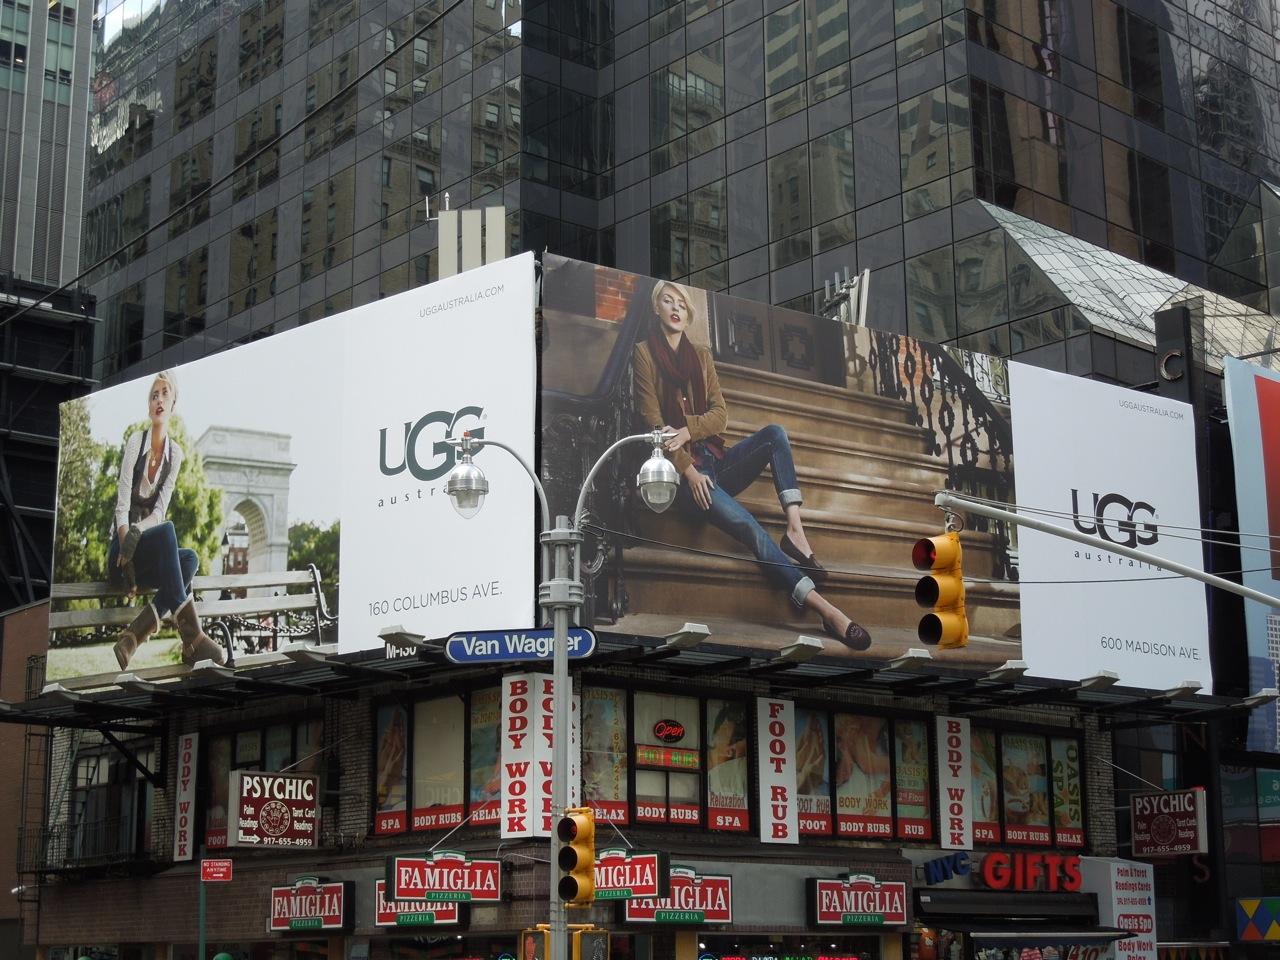 http://2.bp.blogspot.com/-LsKX5dMiSRE/UEe-USu92GI/AAAAAAAAzUk/GXVriRArE-o/s1600/Ugg+Times+Square+billboards.jpg